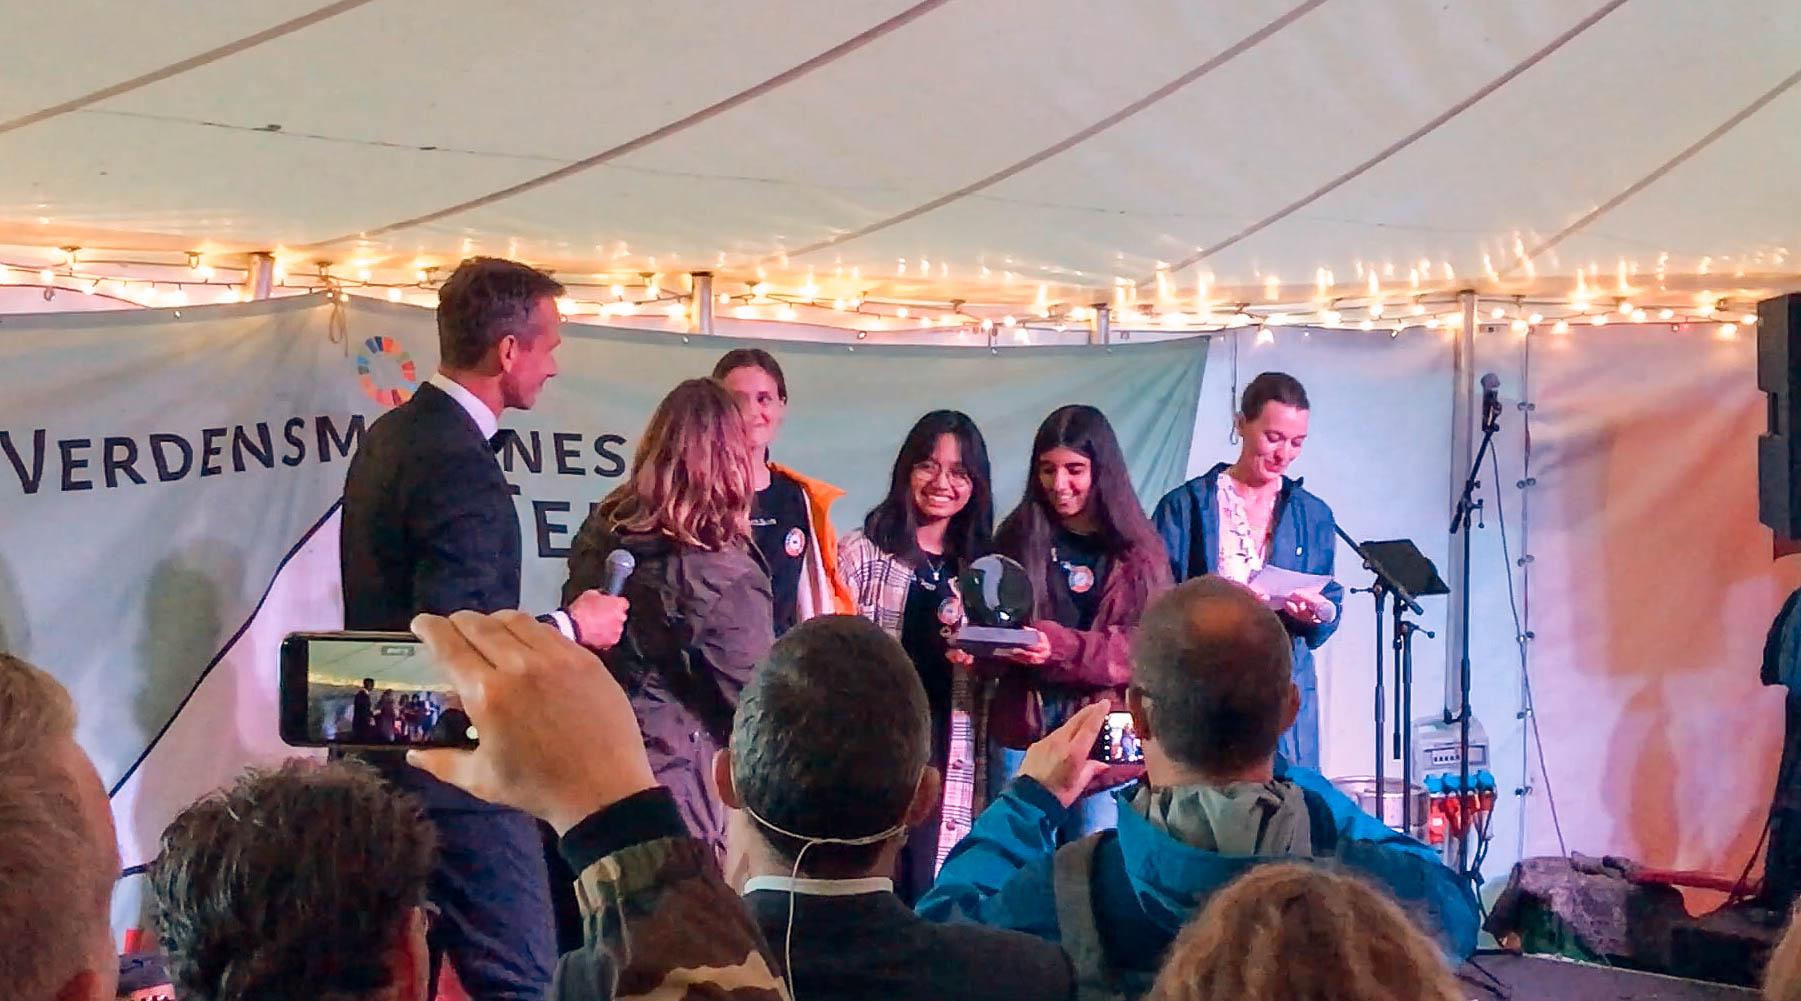 Elever fra Gram Skole modtager Verdensmålsprisen i kategorien 'Forandringsprisen'. Foto: Stine Schnor-Olsen